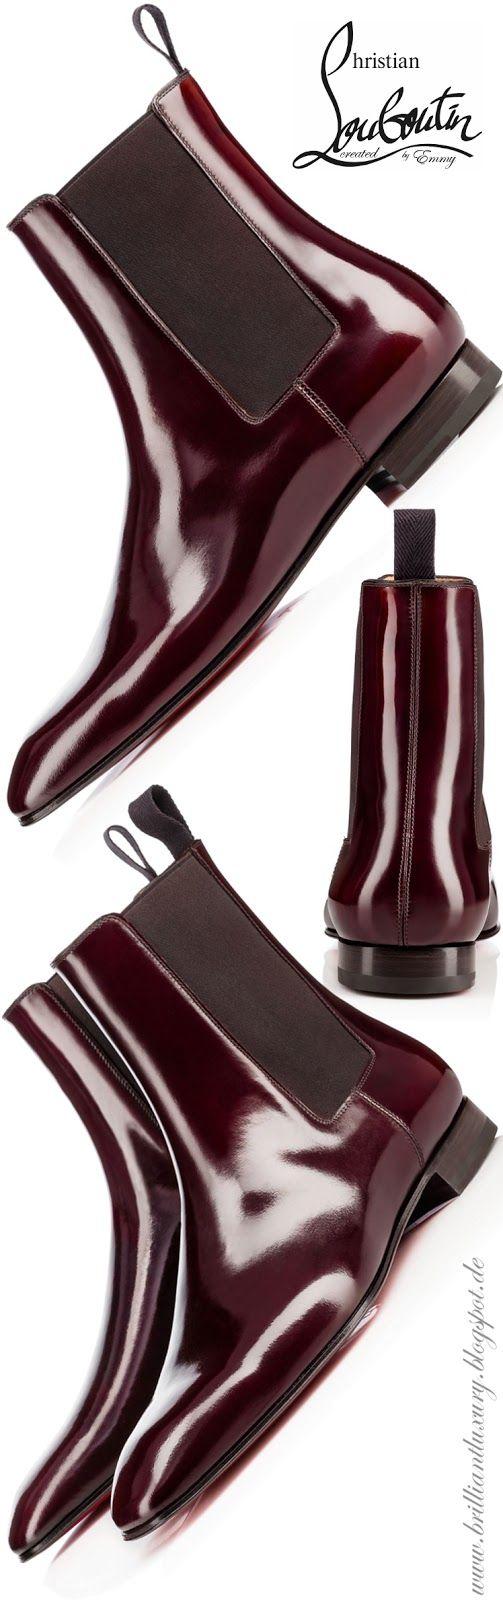 Brilliant Luxury by Emmy DE ♦ Christian Louboutin Roadie Flat